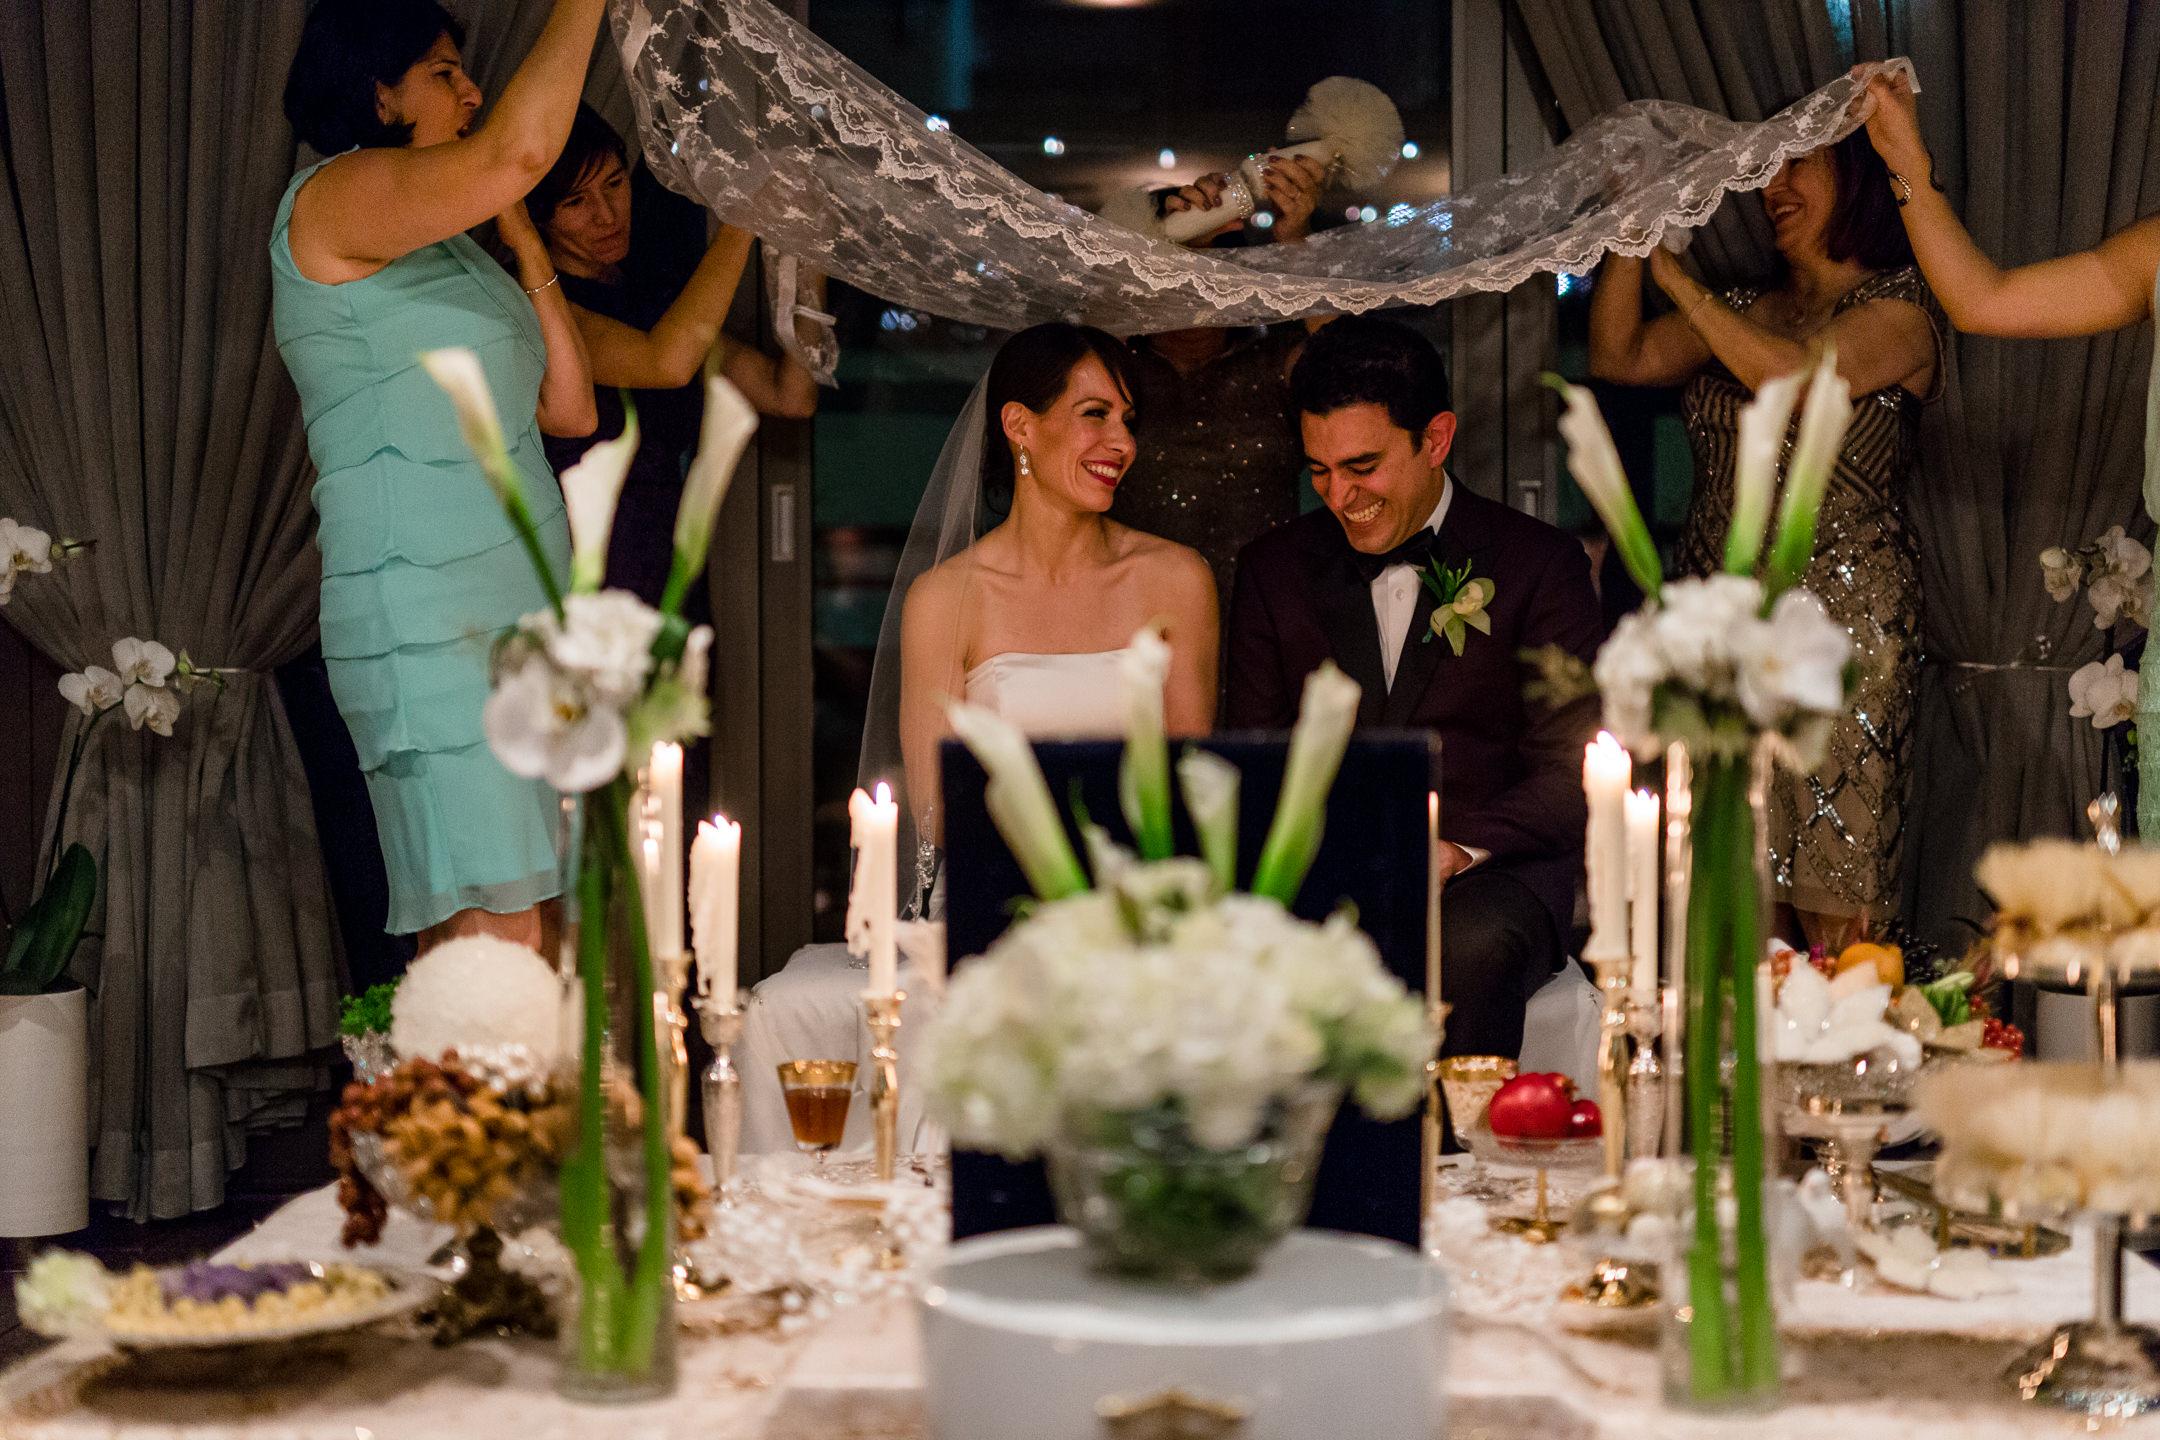 Documentary-Wedding-Photography-Andrew-Tat-Maria & AJ-19.jpg